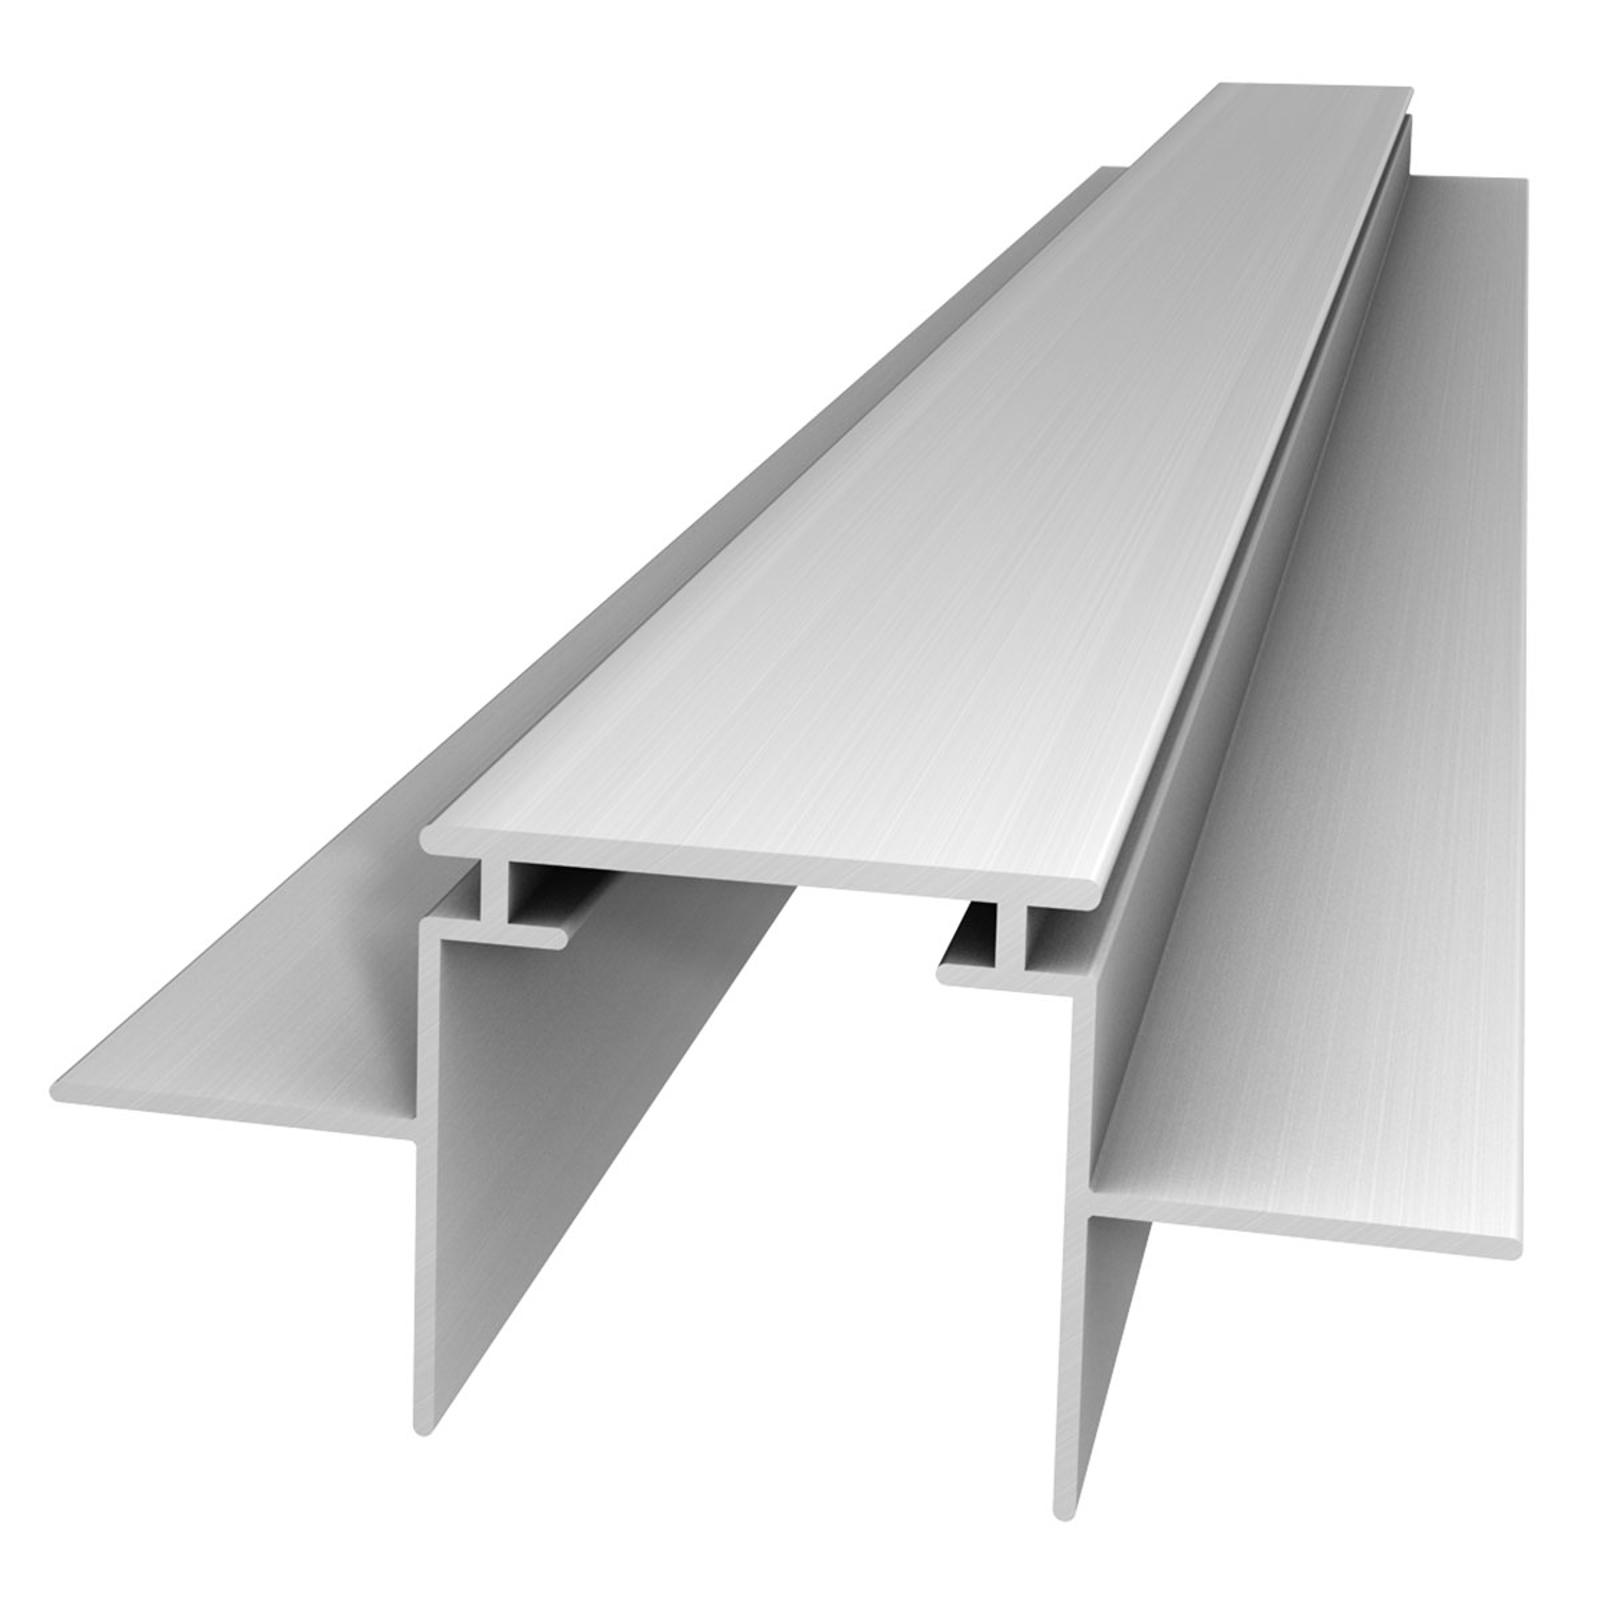 M28 LED aluminium-profil, 66 mm bred bærerprofil